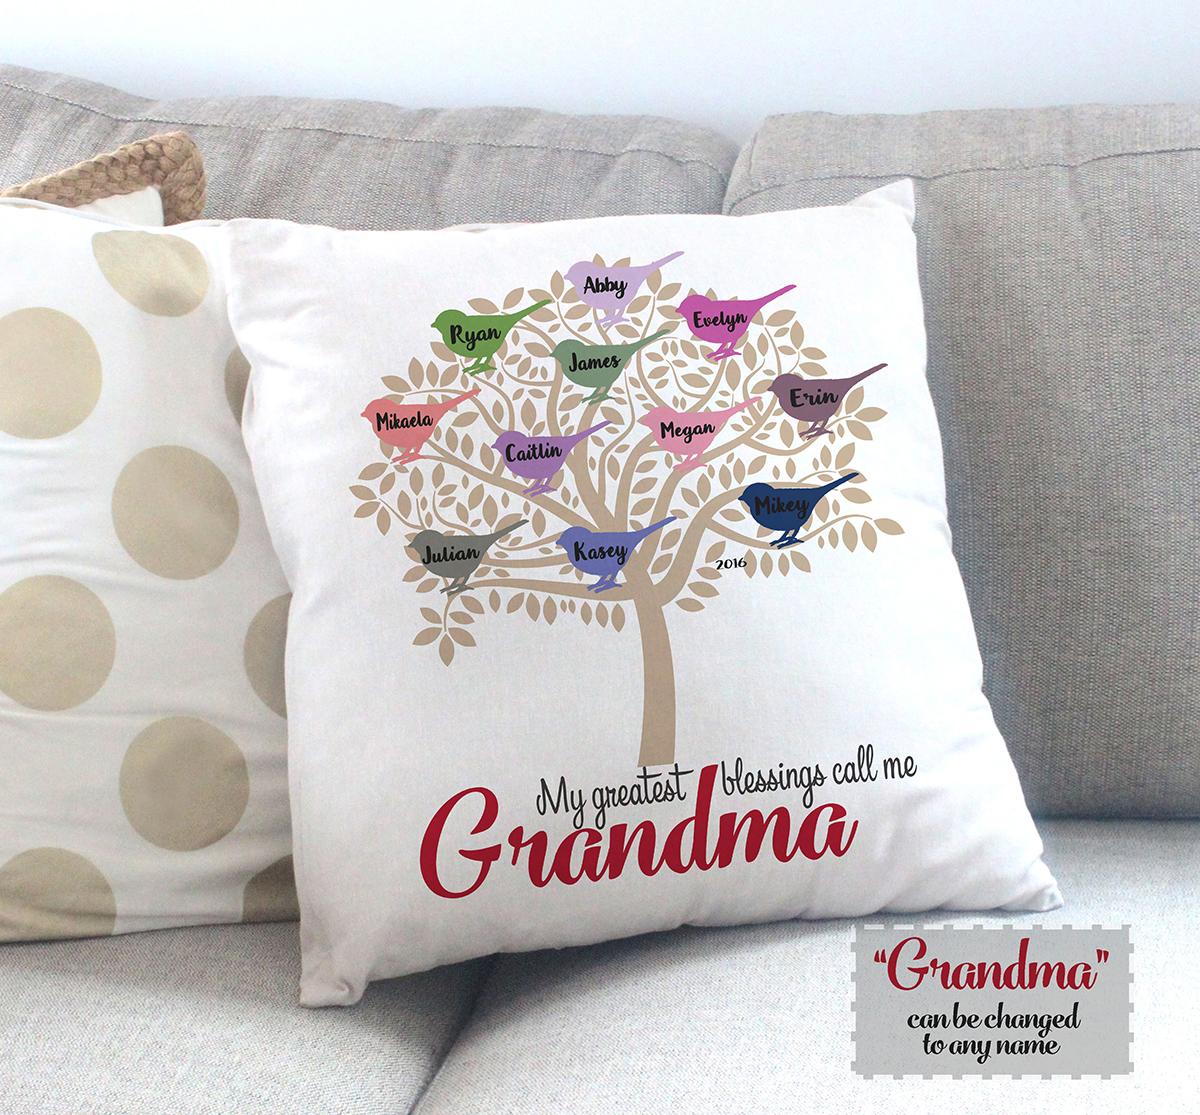 Personalized Grandma Pillow Veveandk Baby Family Kids